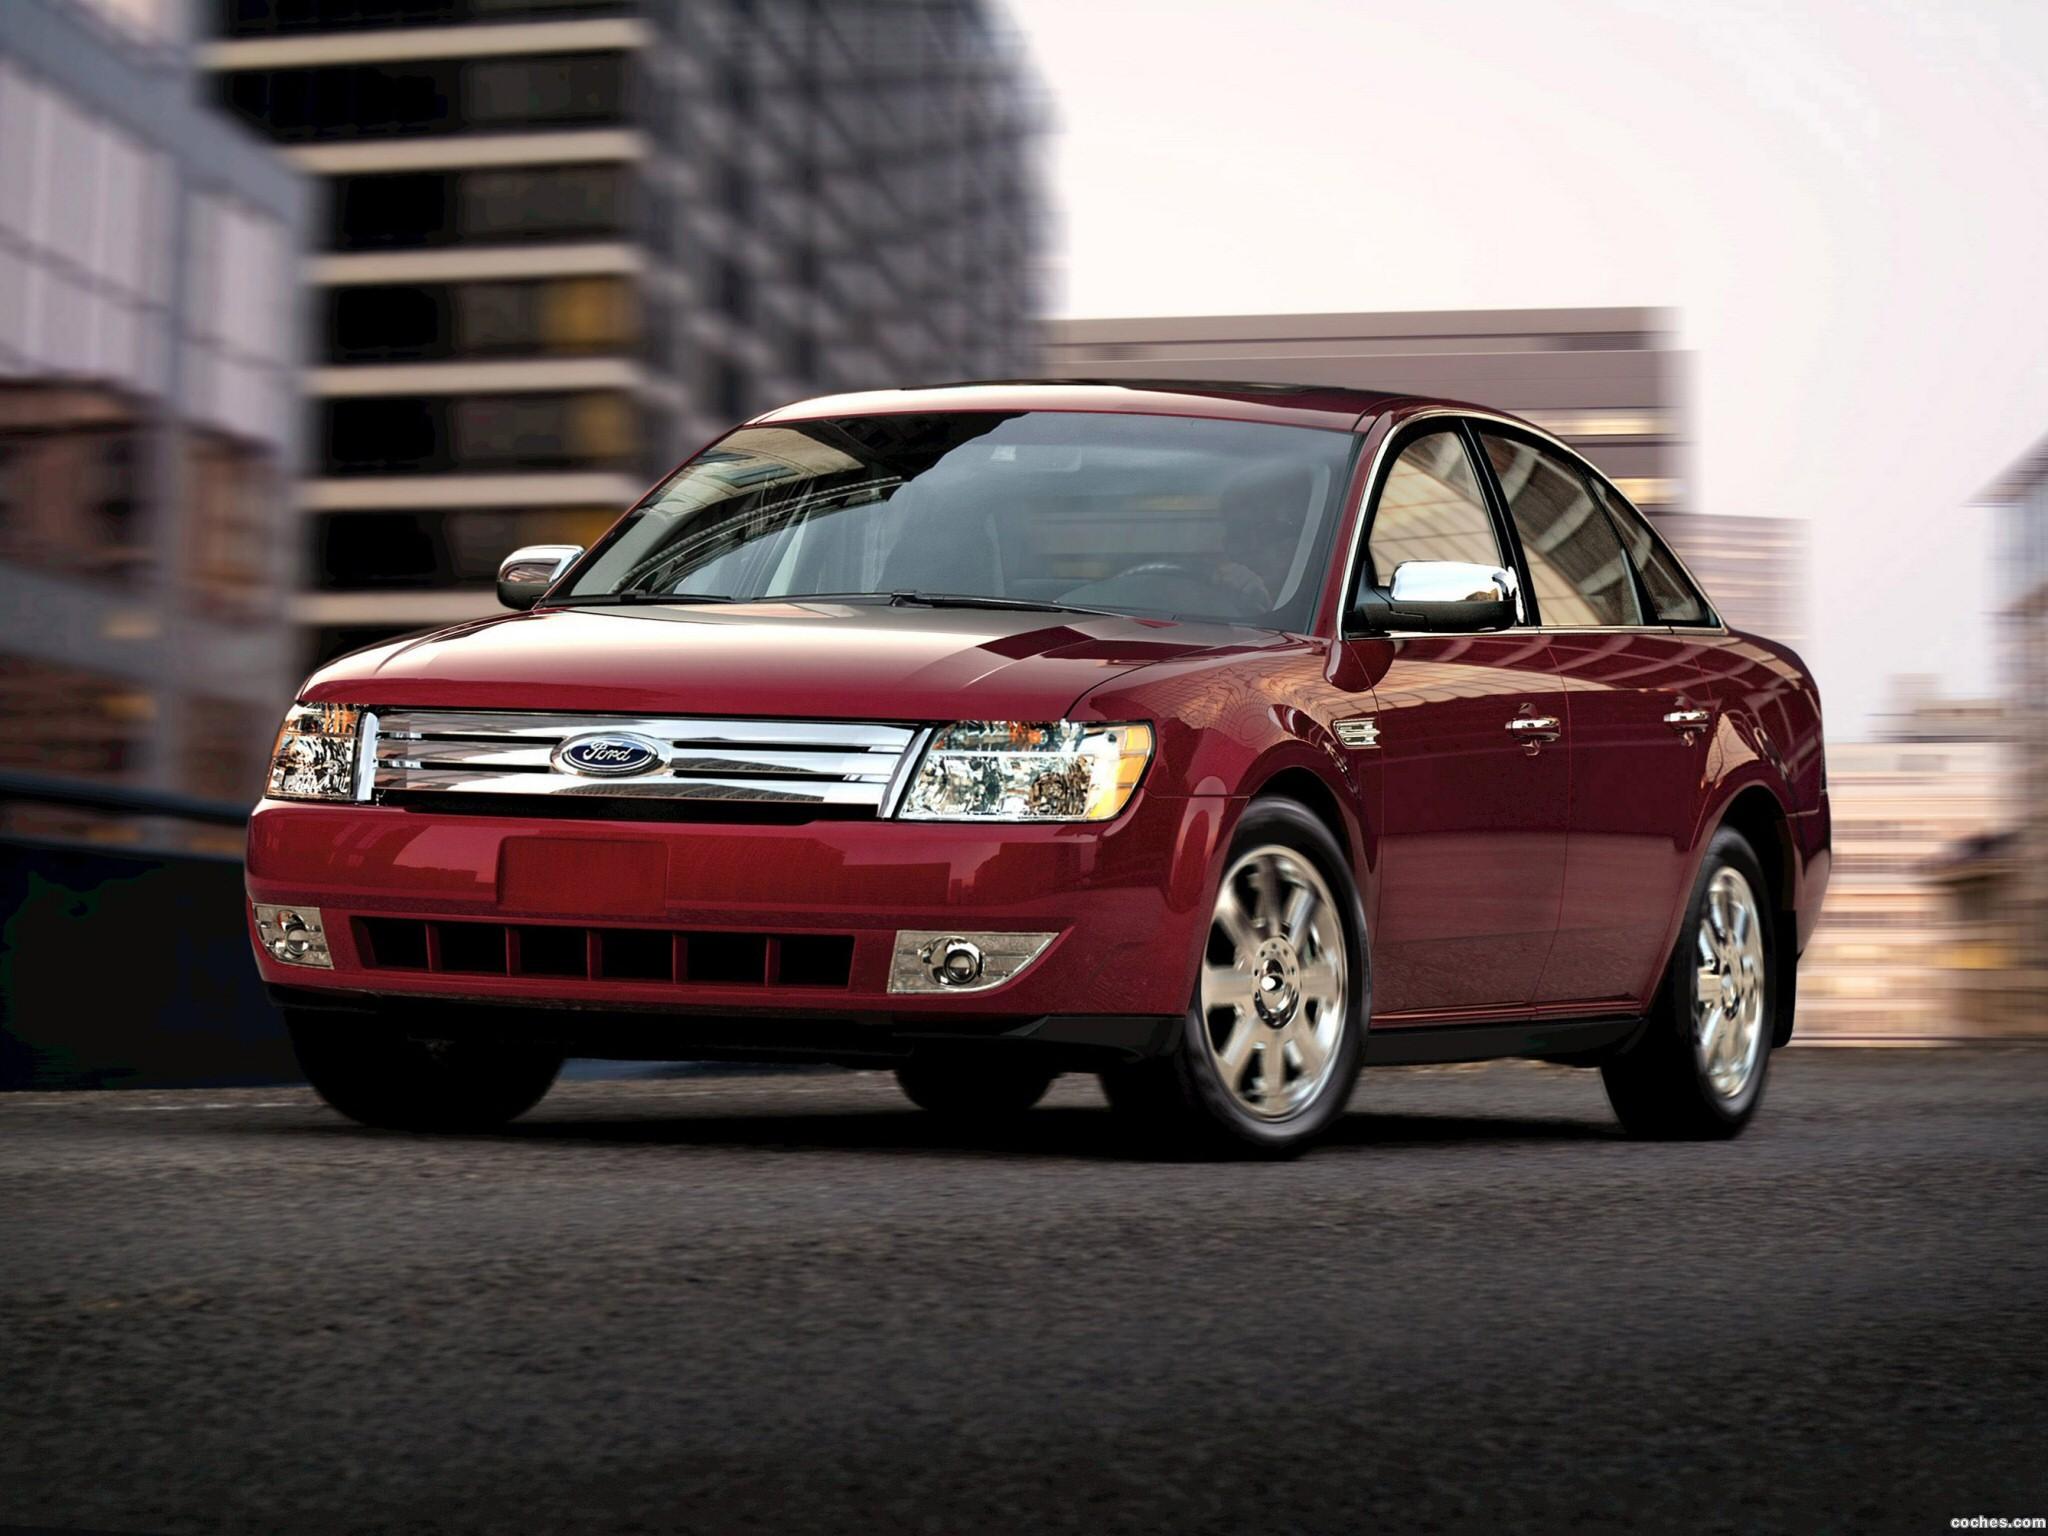 Foto 0 de Ford Taurus Five Hundred 500 2008